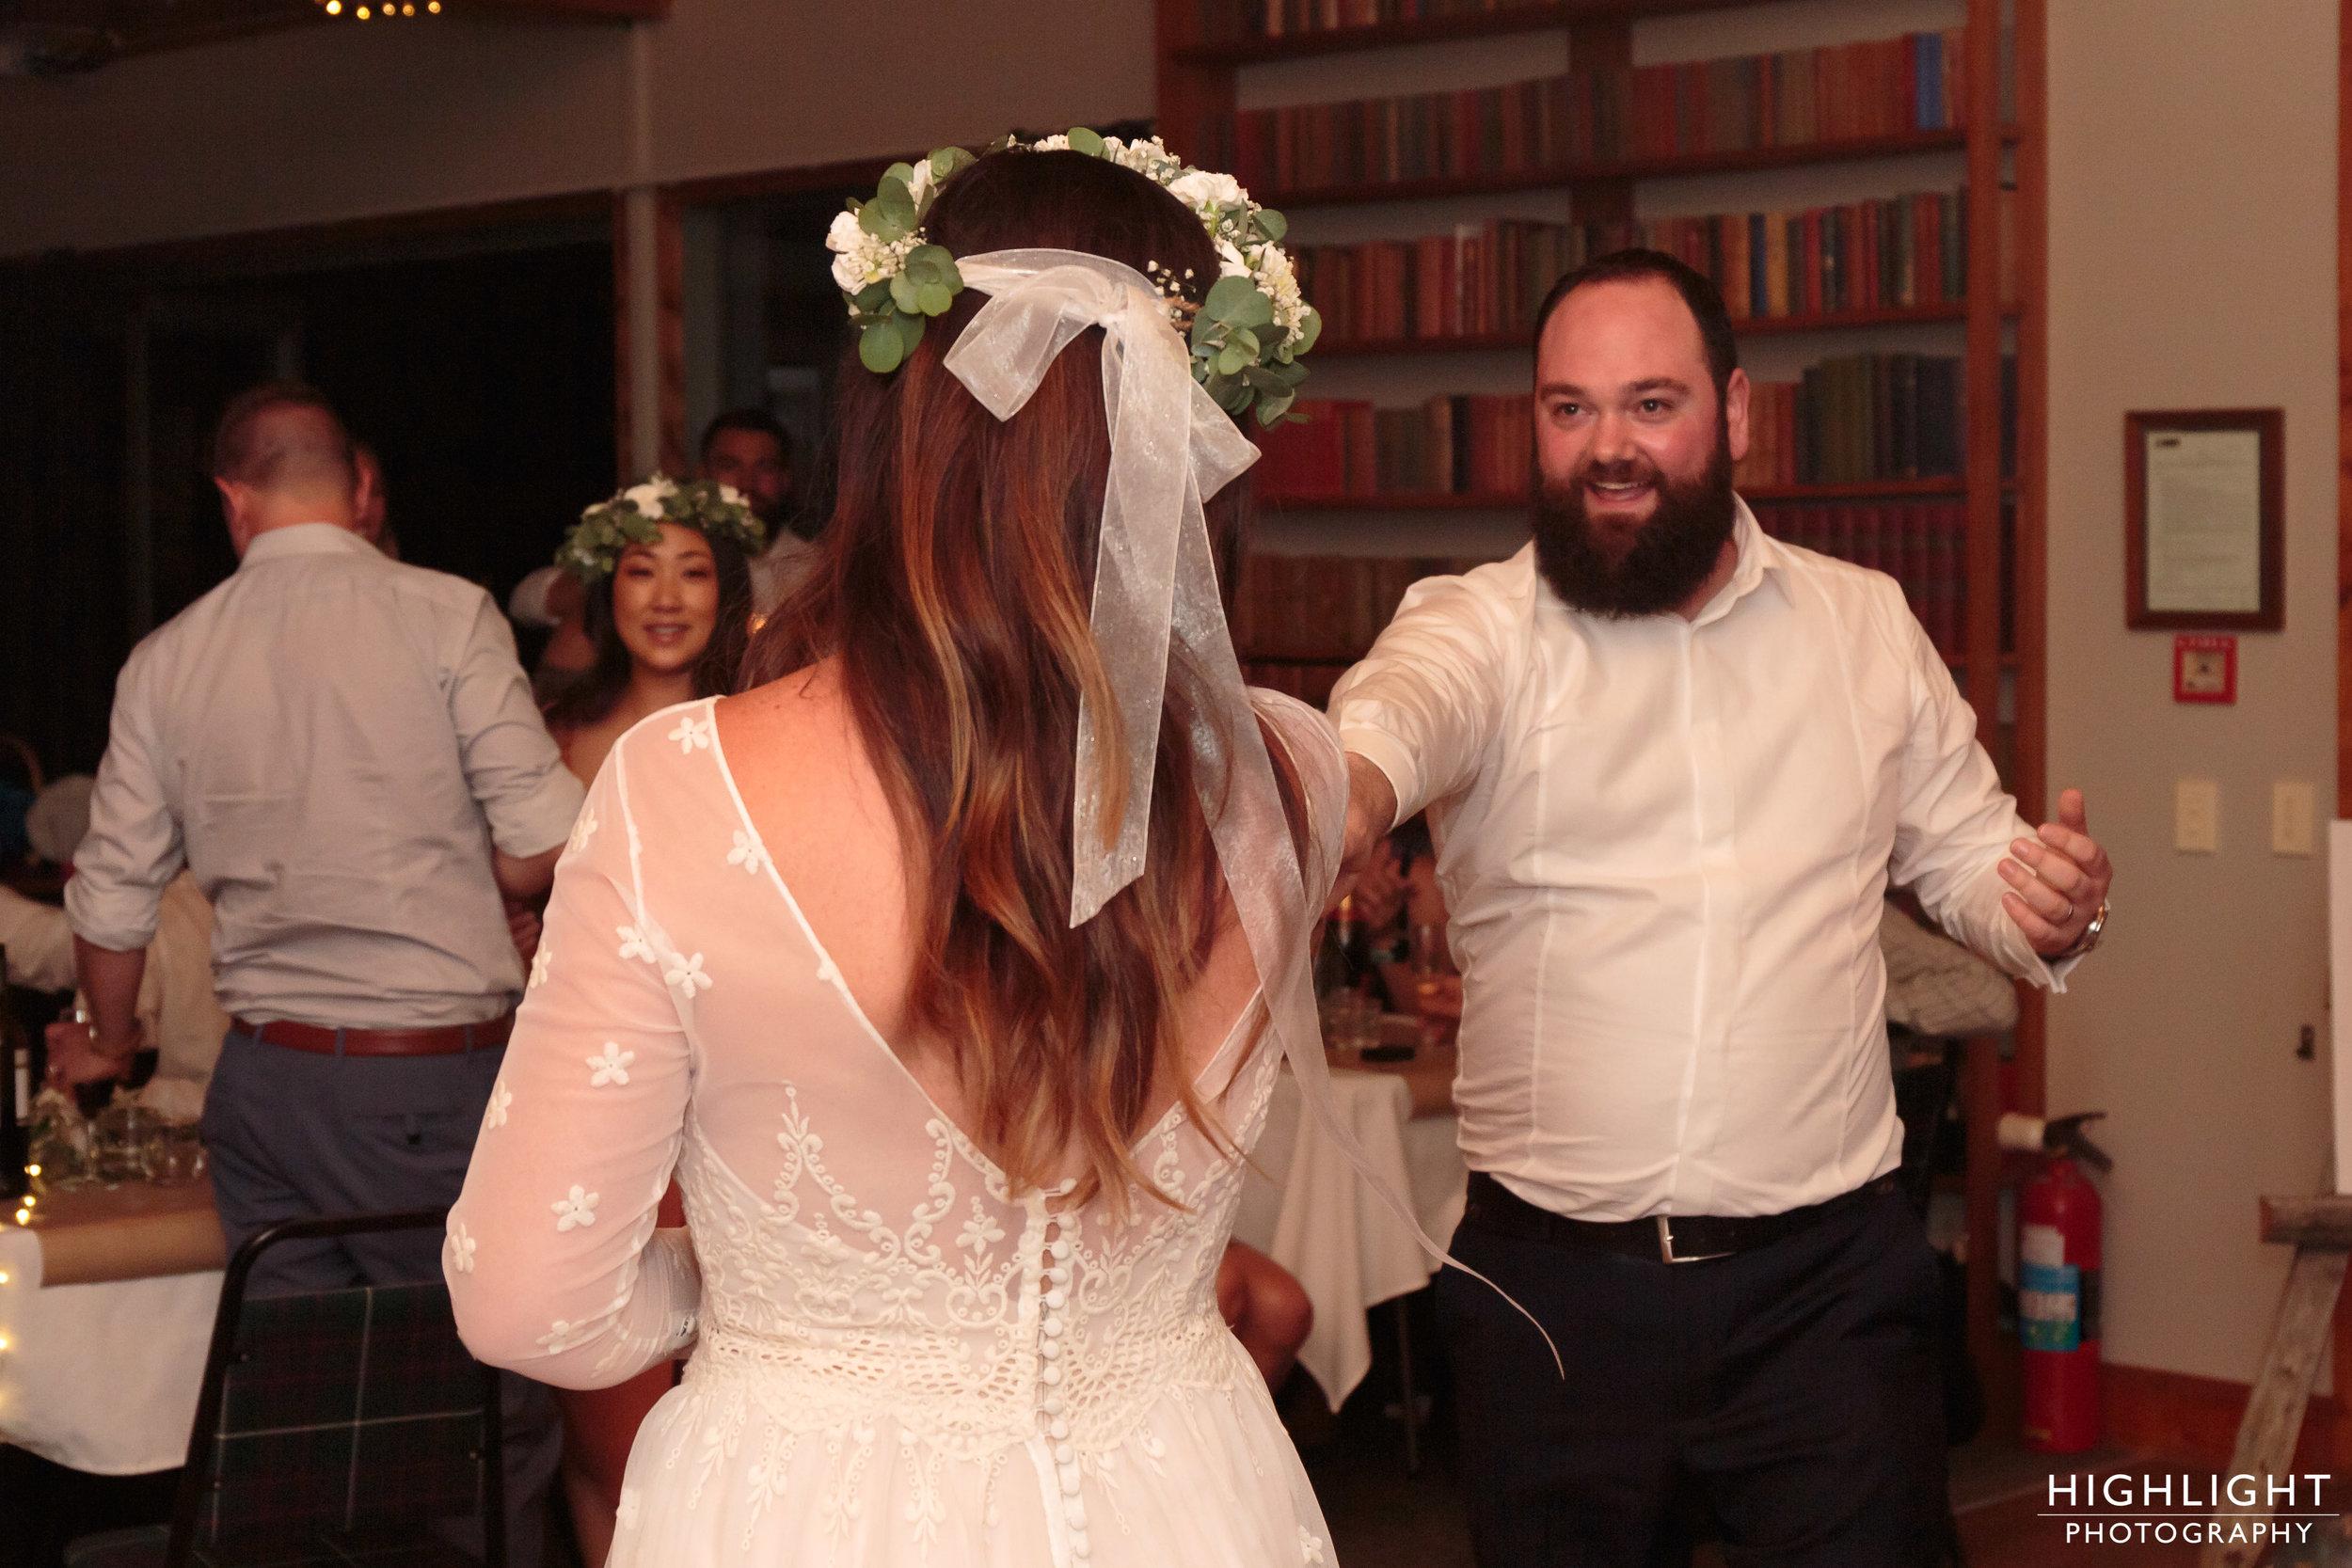 highlight-wedding-photography-new-zealand-makoura-lodge-wedding-189.jpg